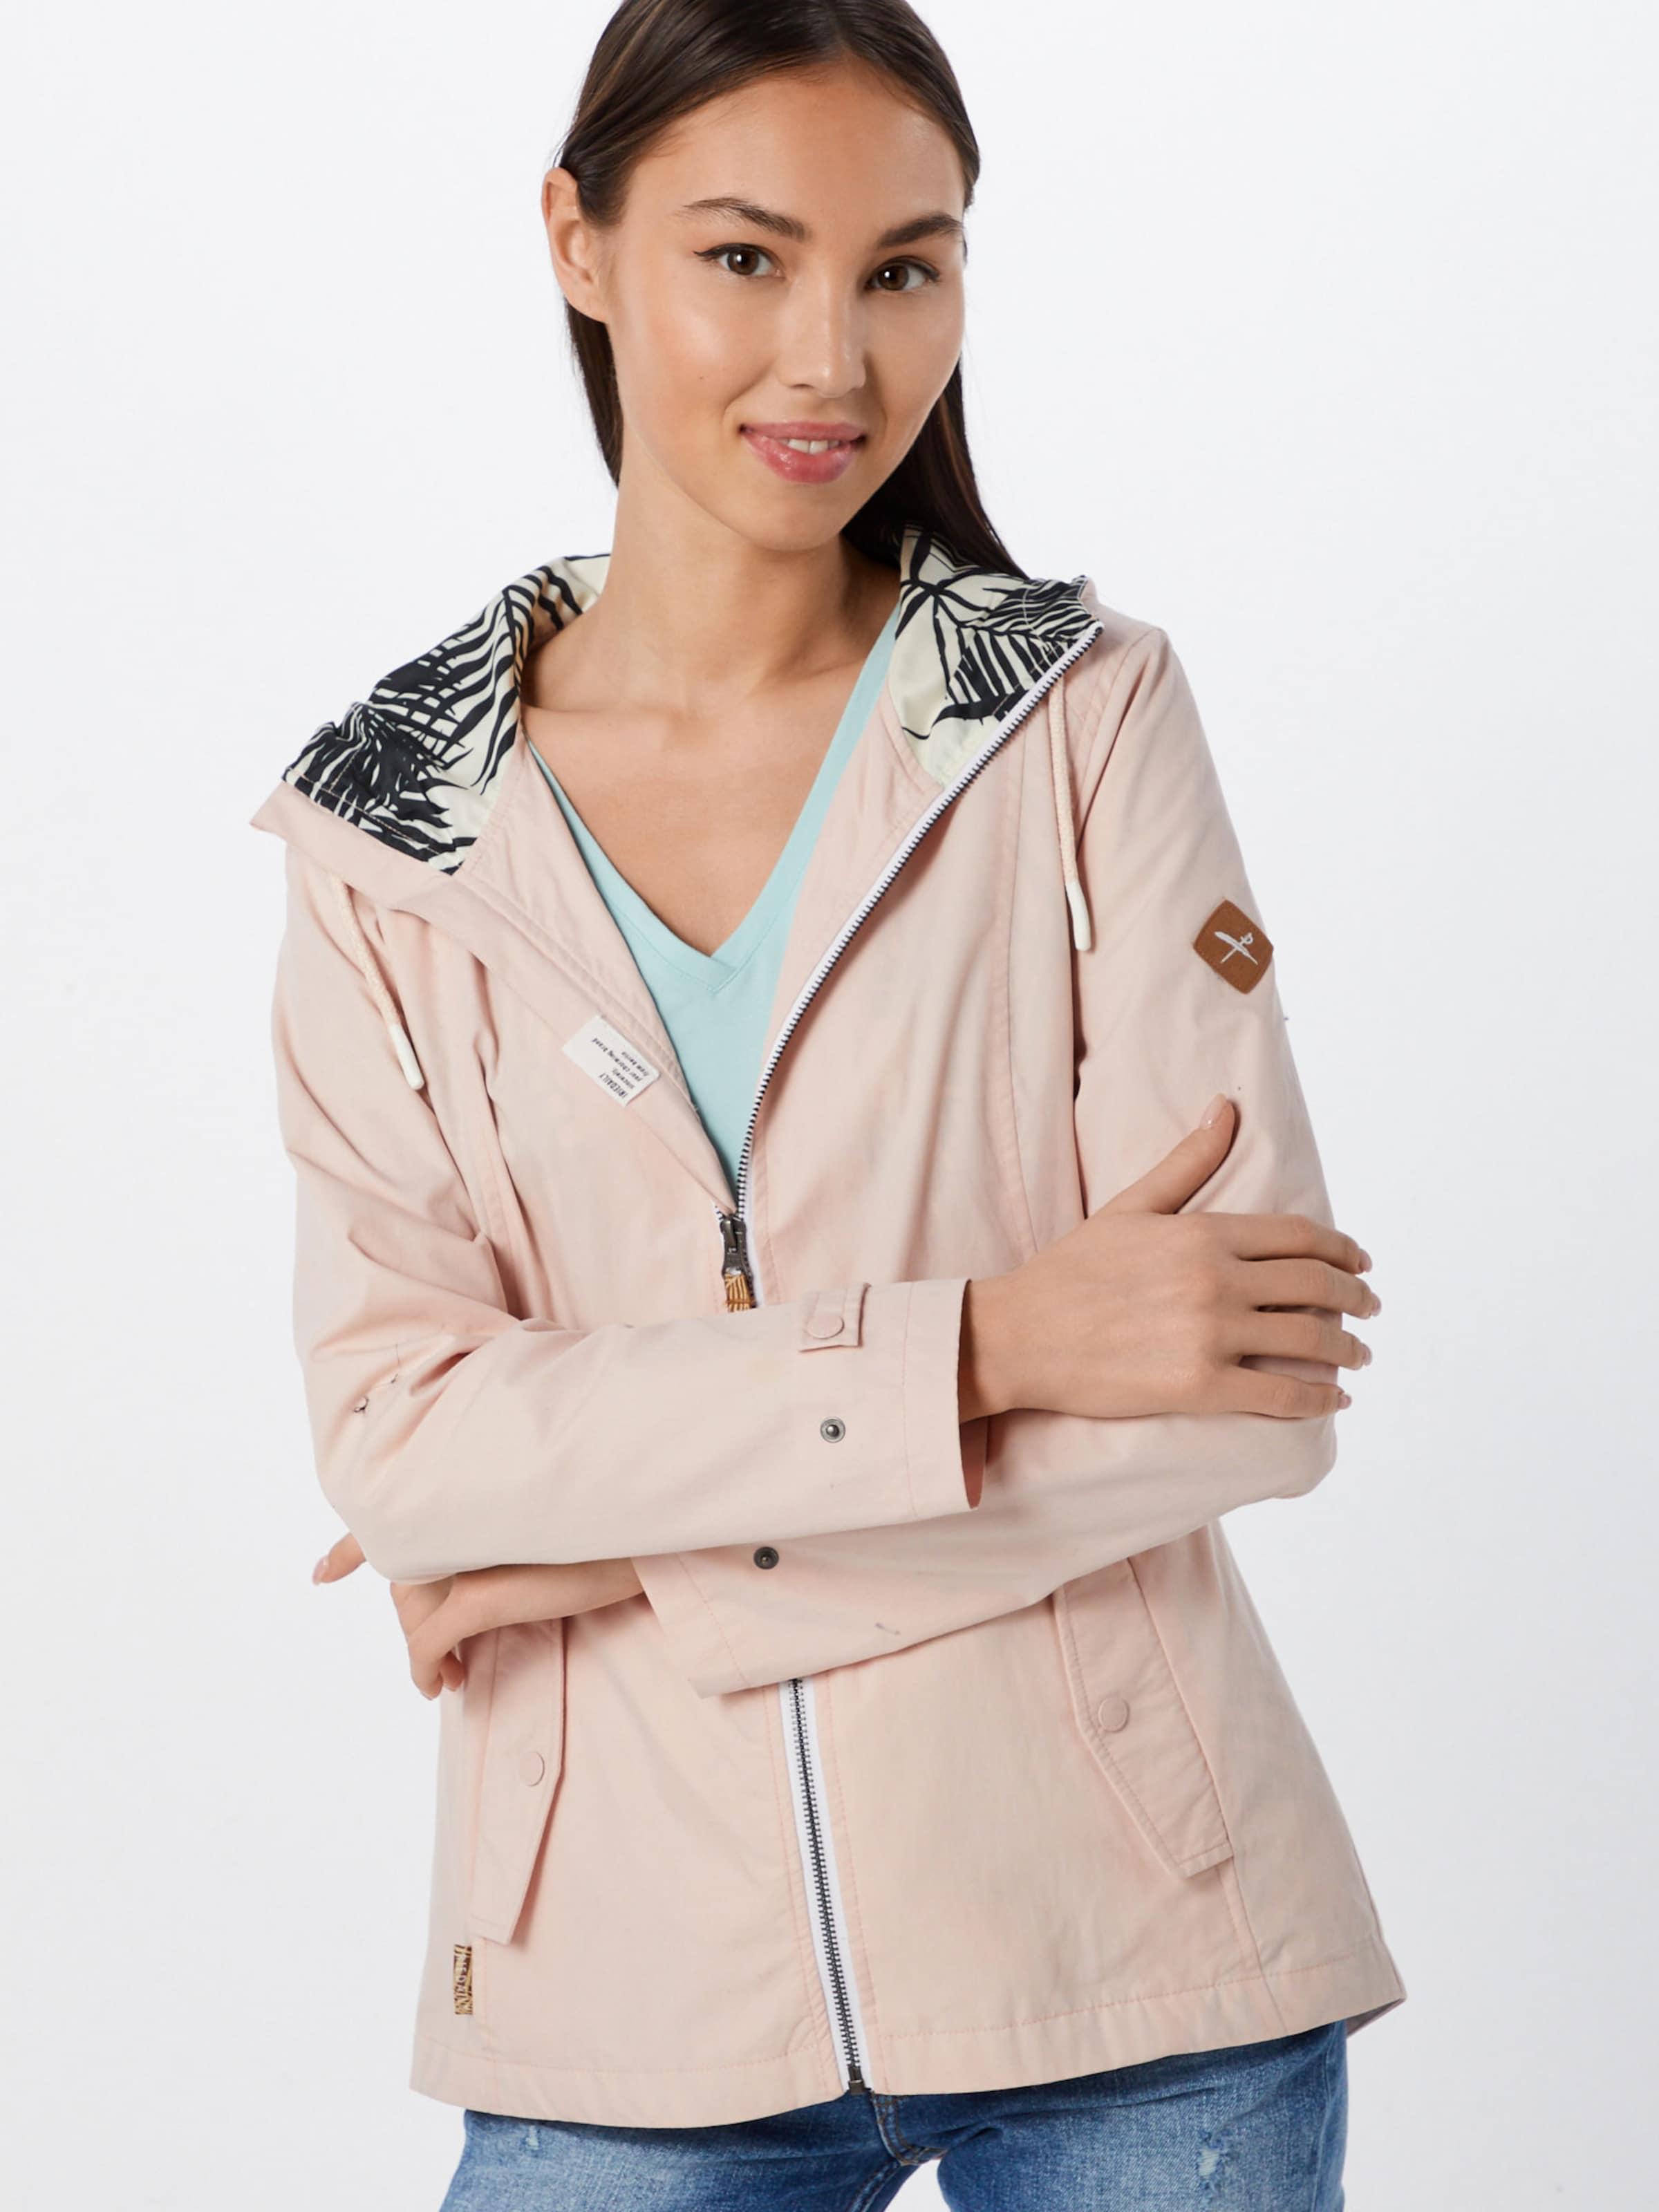 Mi En Iriedaily Veste 'kishory Up Jacket' Rose saison 0myOvNn8w